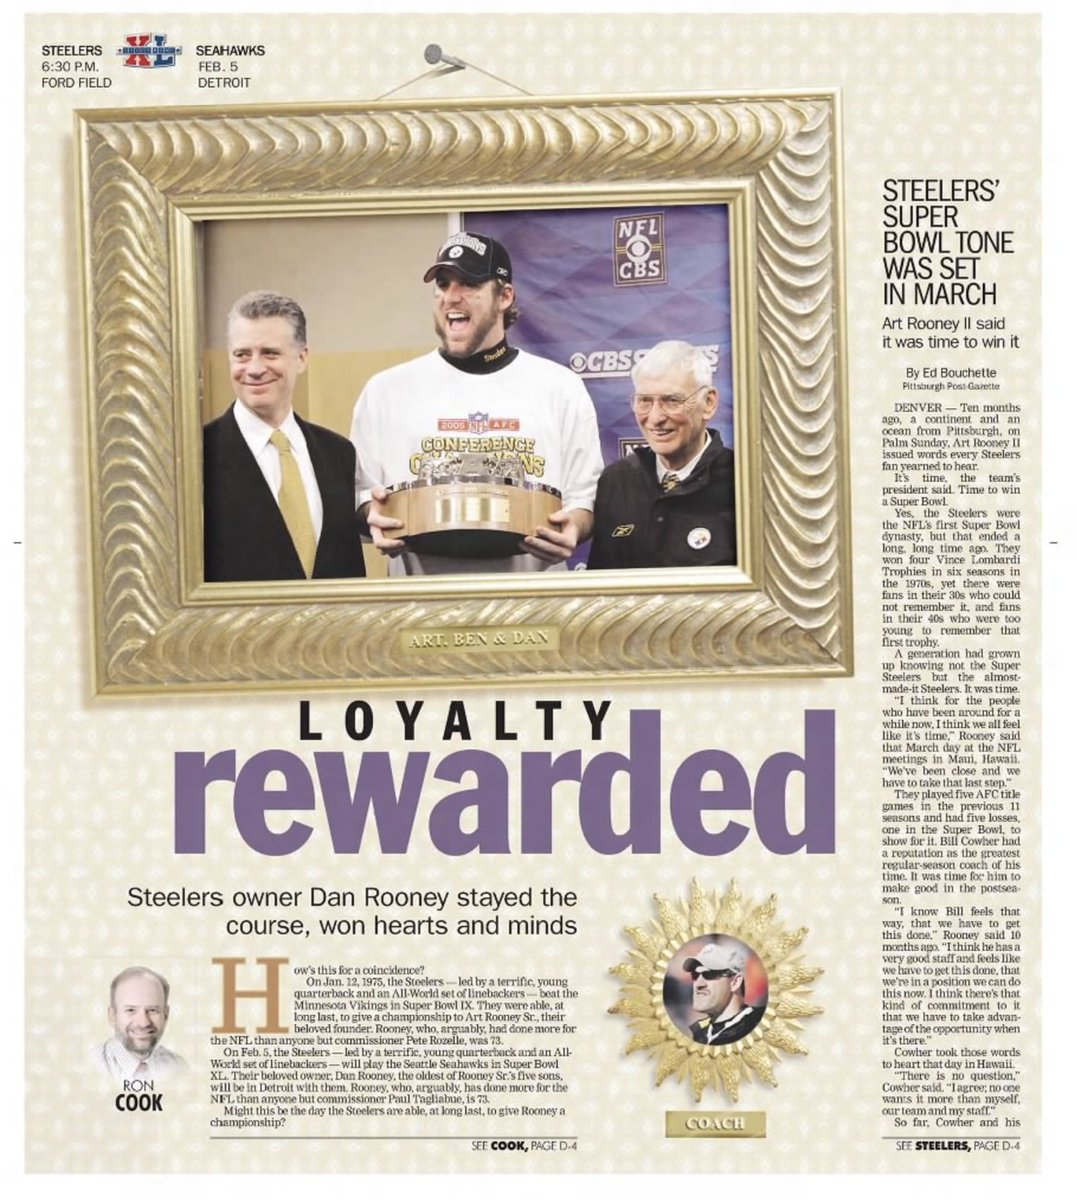 15 years ago (1/24/06): Rooneys' leadership key to #Steelers' Super Bowl run. #HereWeGo